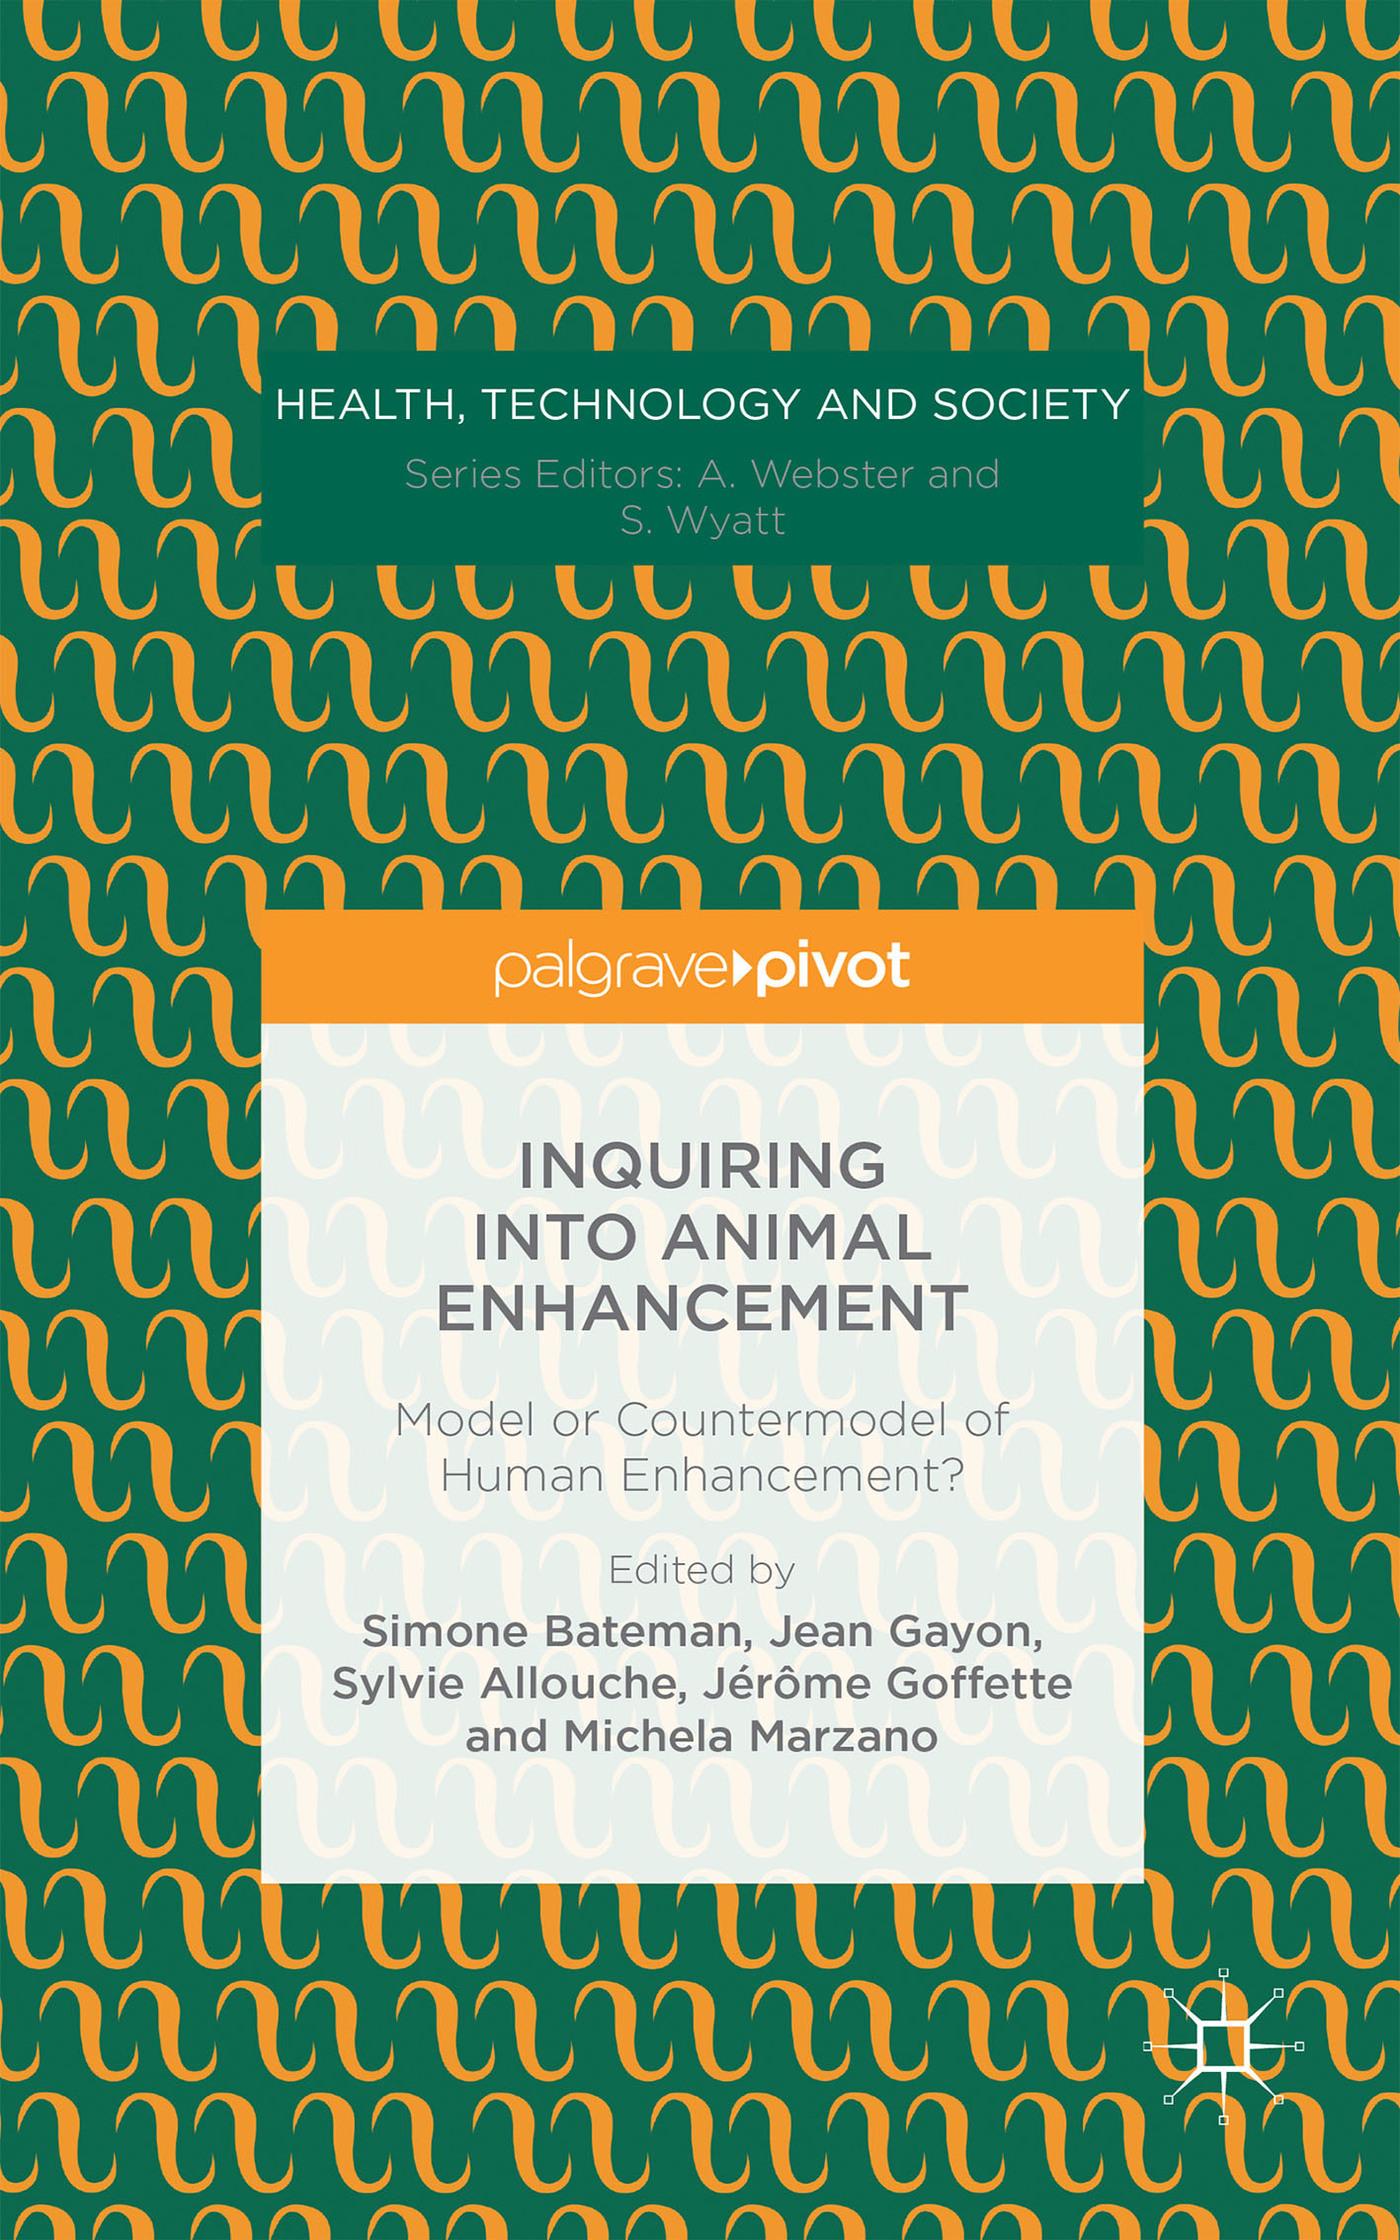 Inquiring into Animal Enhancement: Model or Countermodel of Human Enhancement?  by  Simone Bateman